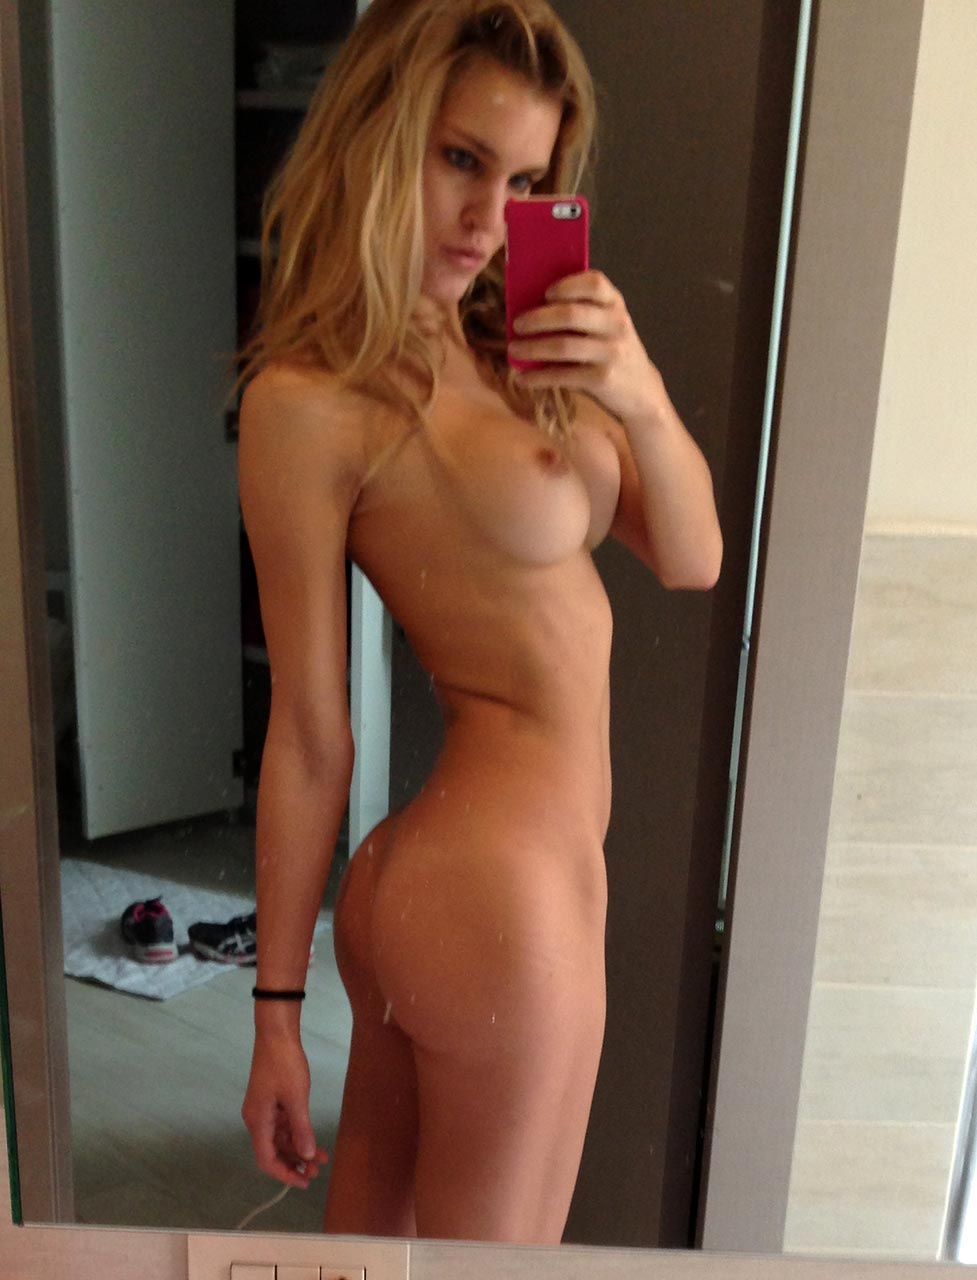 Joy Corrigan Naked model joy corrigan nude & topless leaked private pics [new